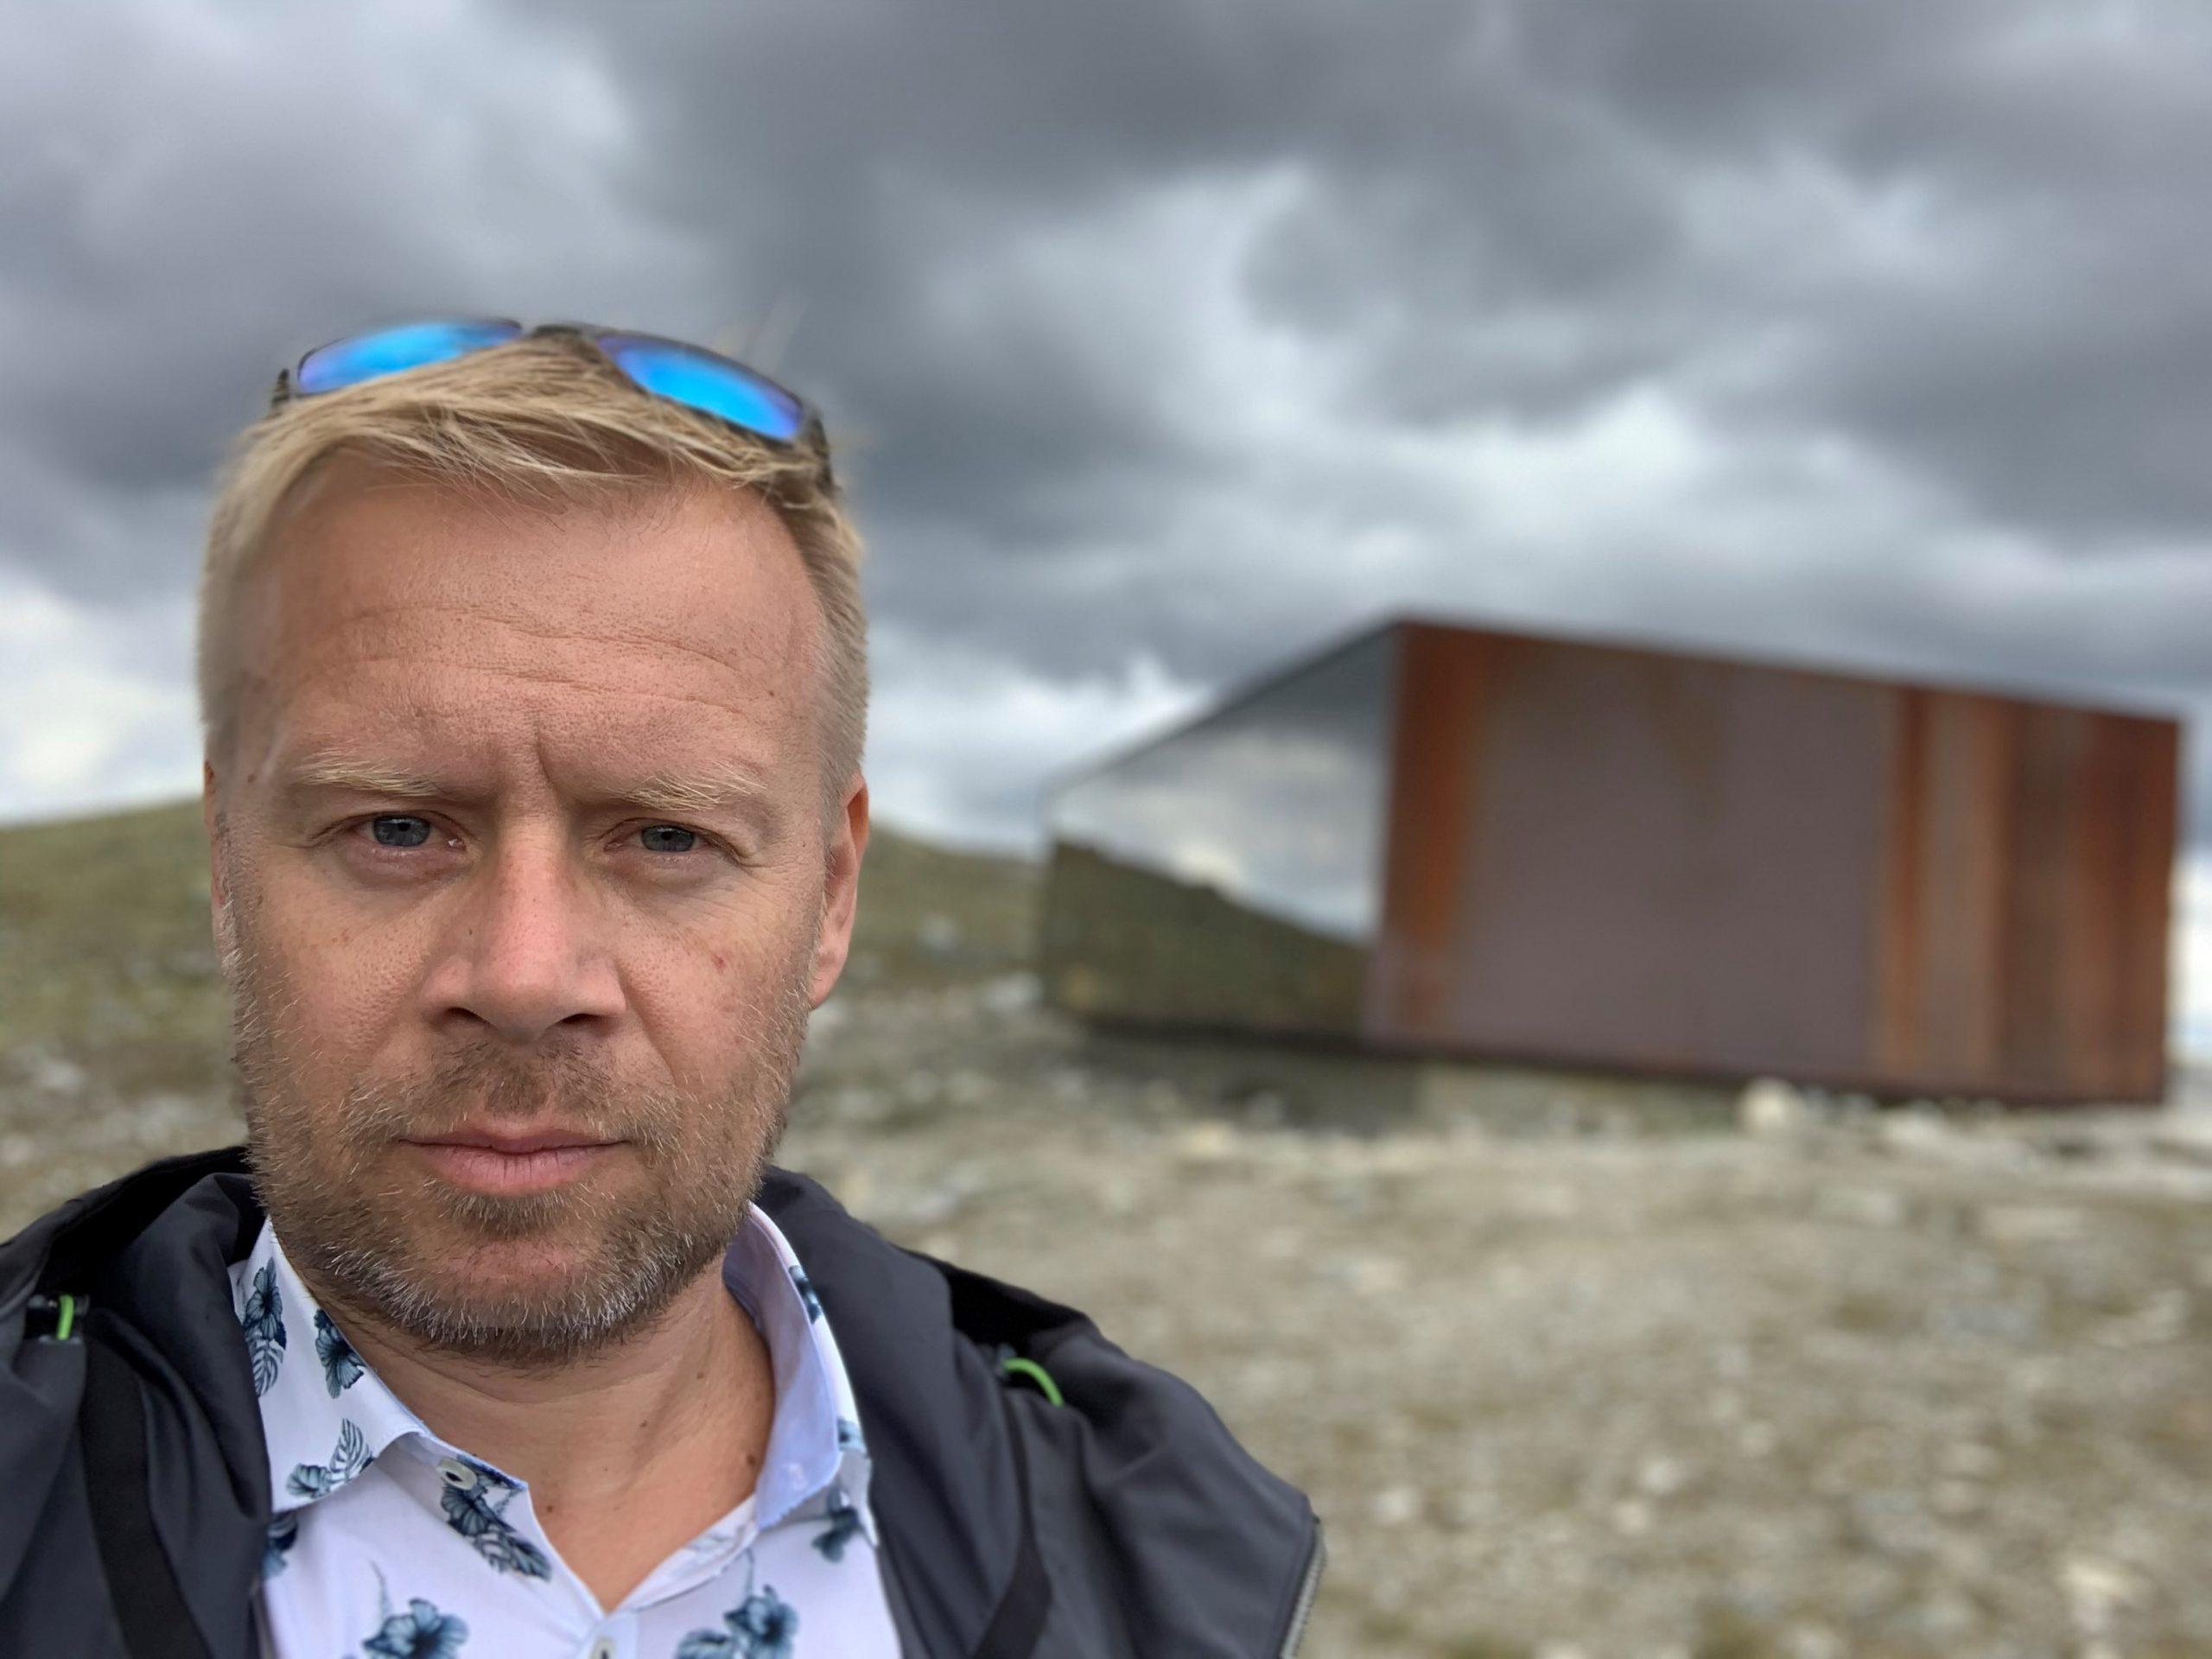 Lars Erik Erøy